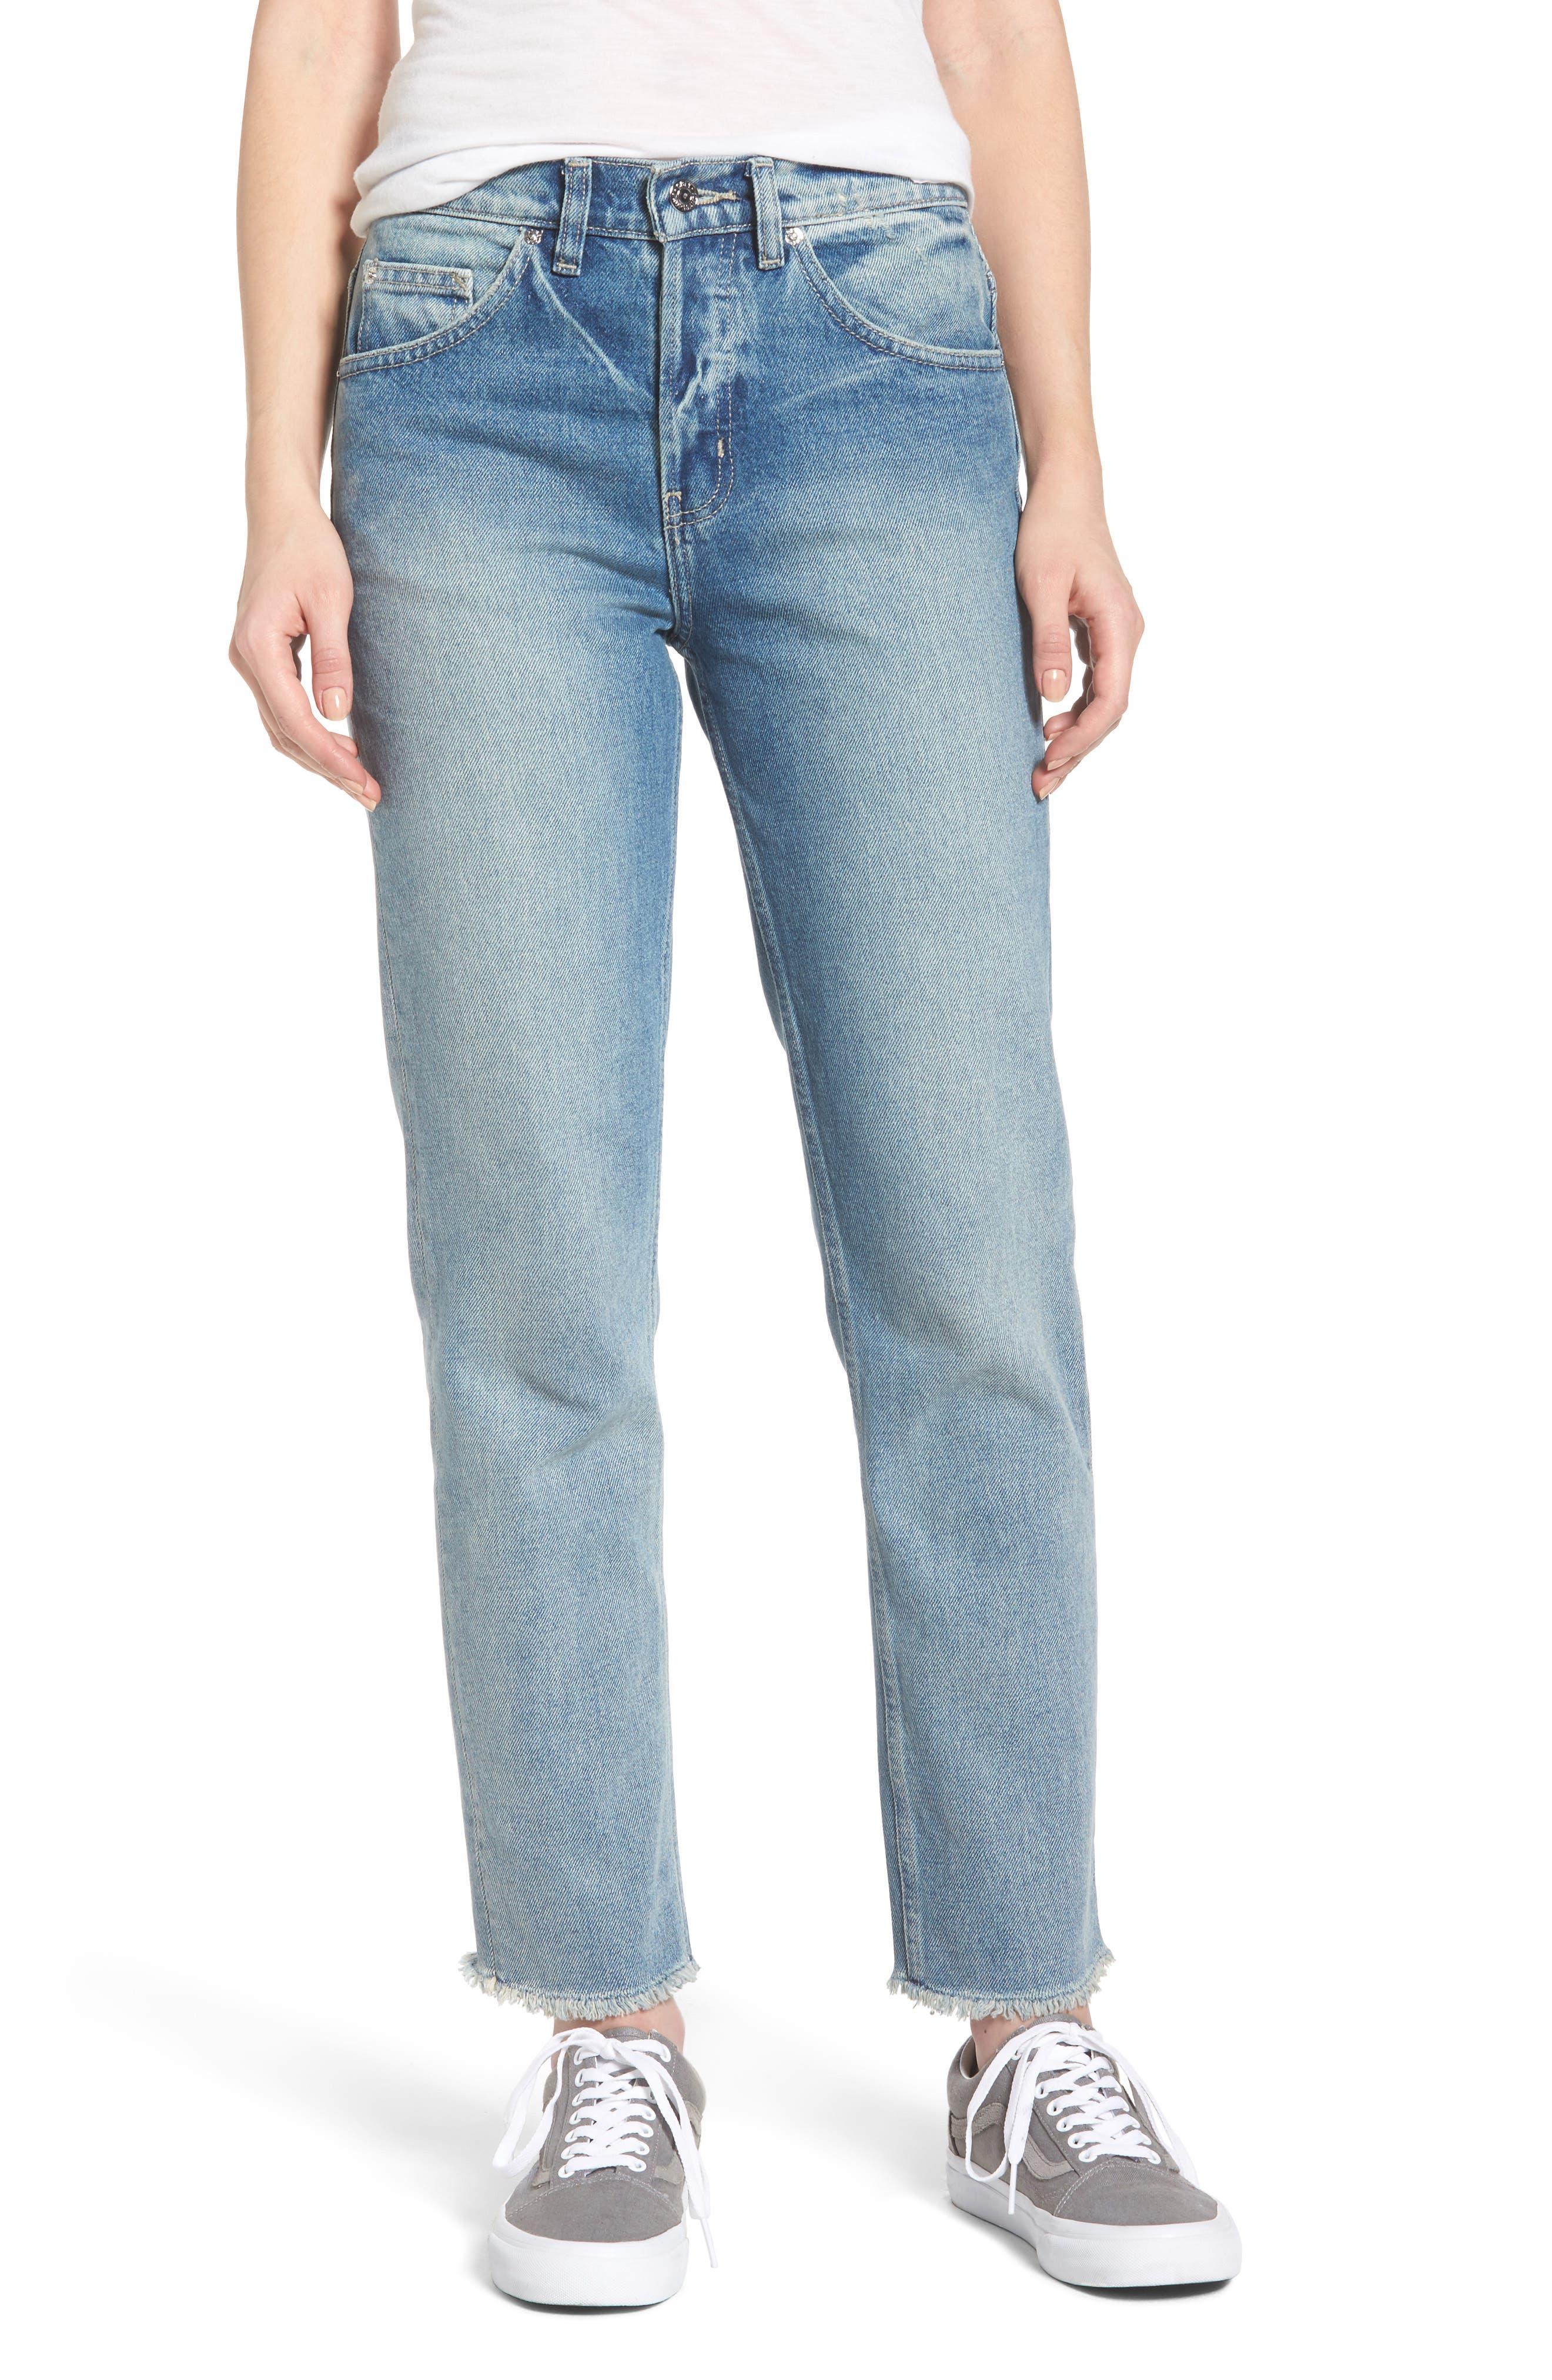 Obey Sundays Straggler High Waist Jeans